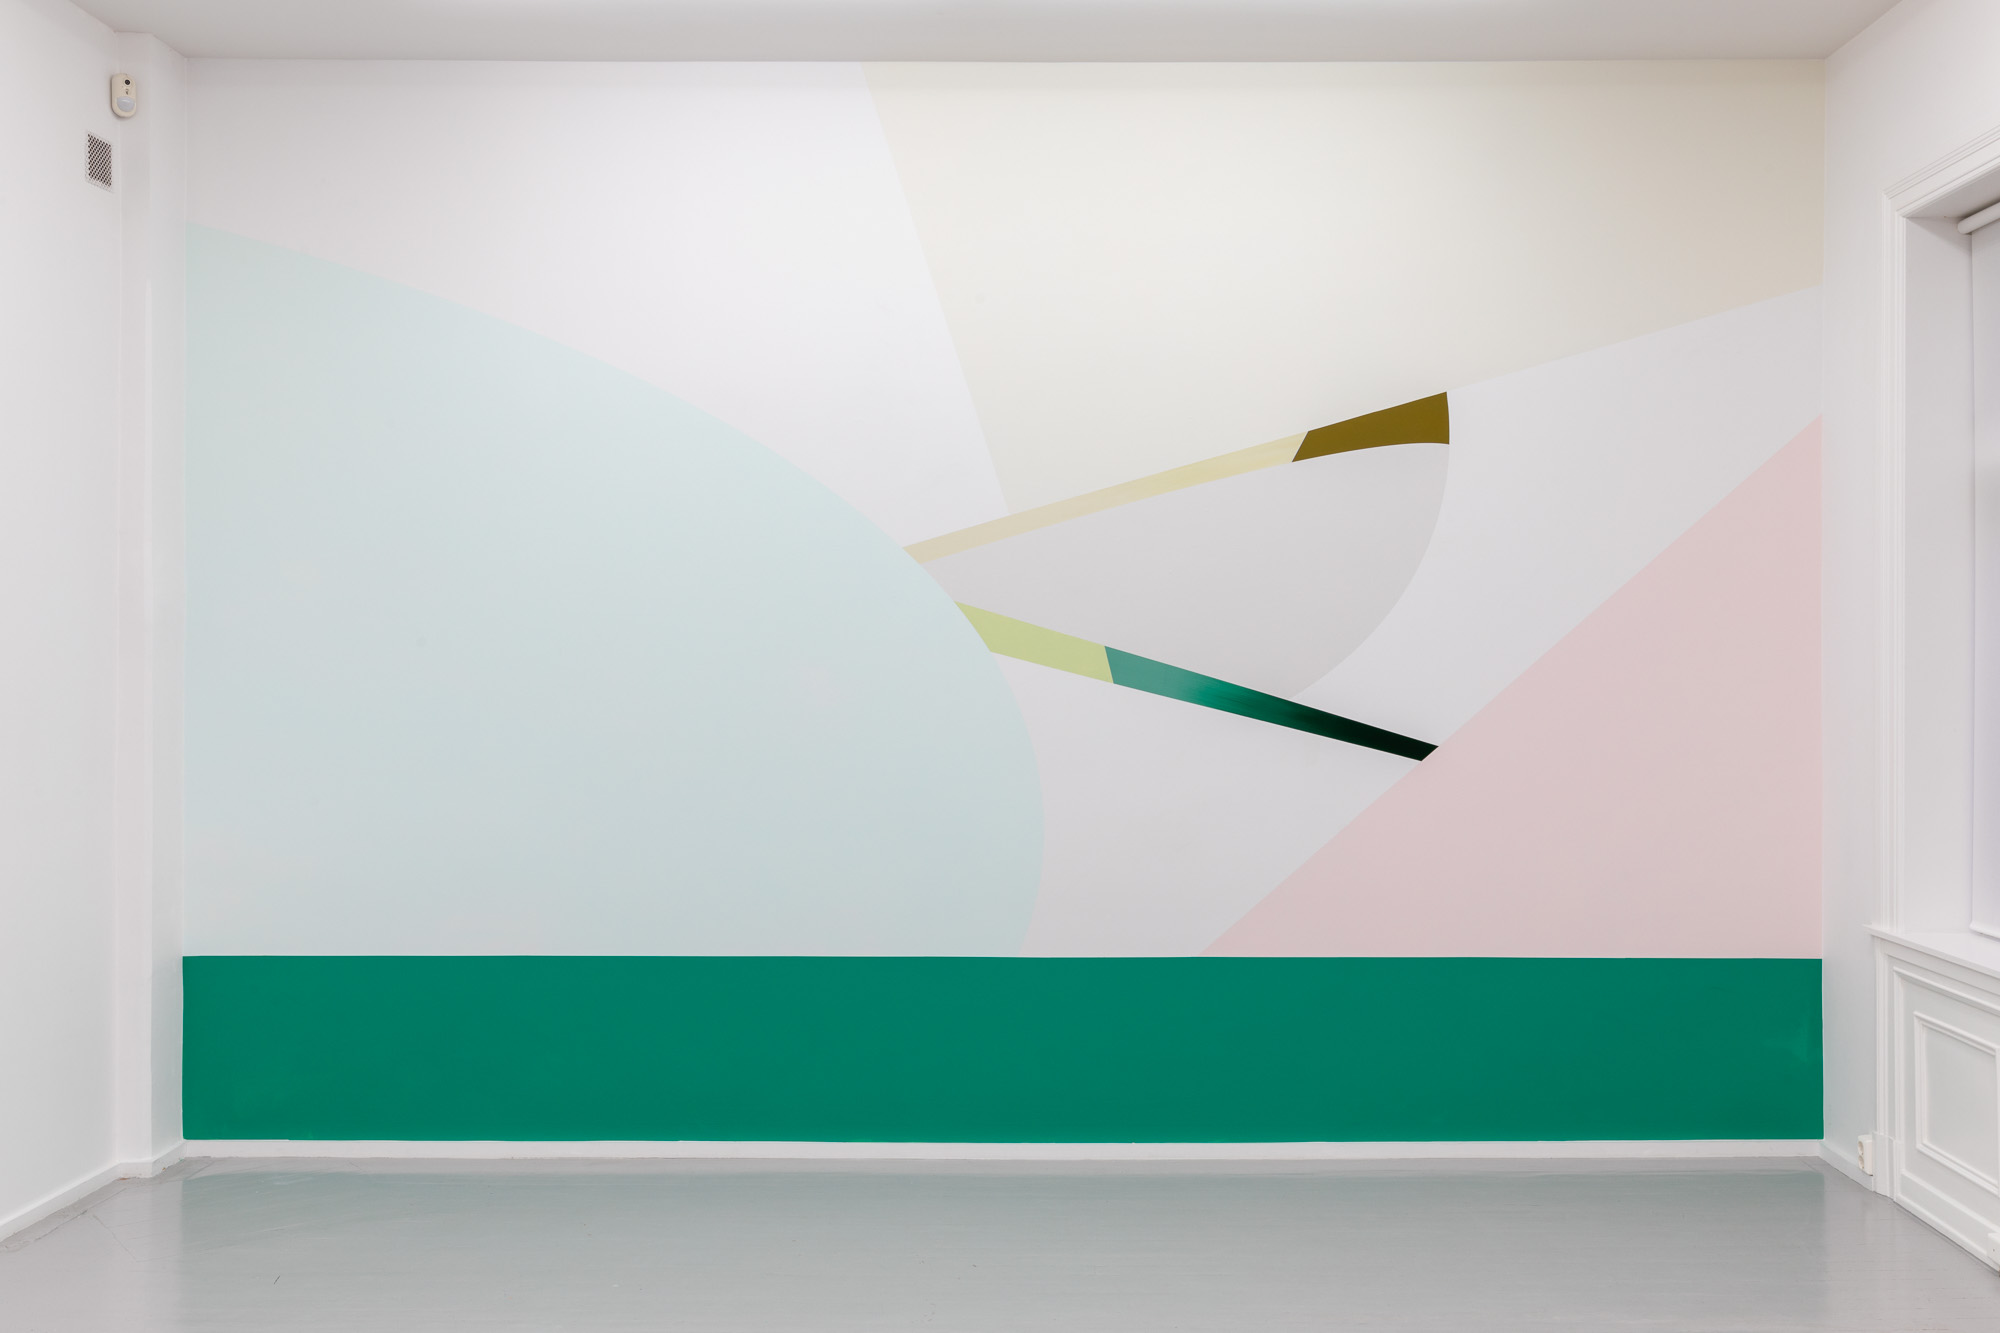 Across Corners, 2020, Acrylic on wall, 340 x 507 cm (Galleri Riis version), Unique